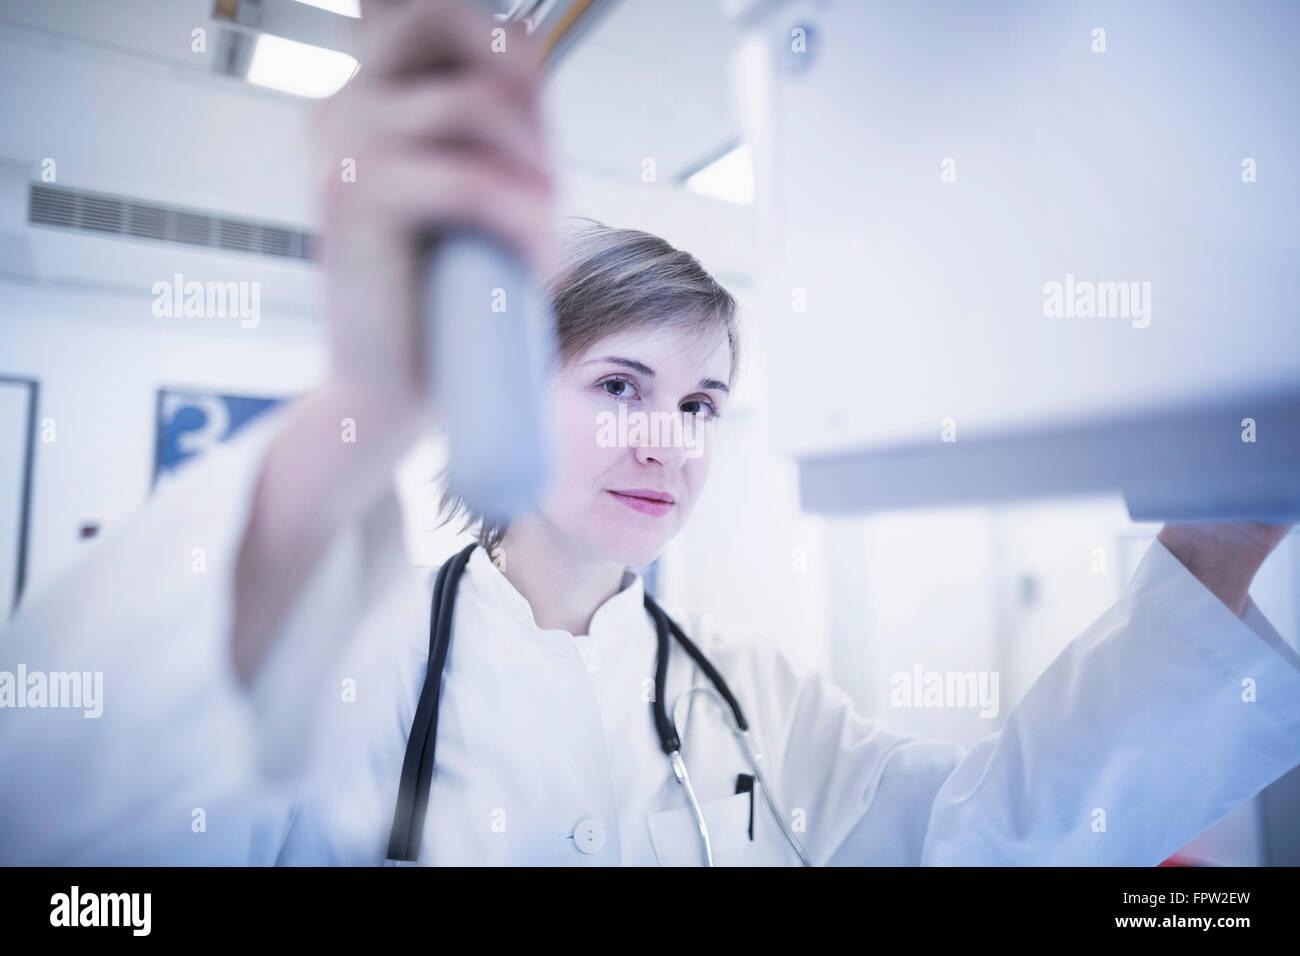 Young female doctor using x-ray machine in hospital, Freiburg im Breisgau, Baden-Württemberg, Germany - Stock Image